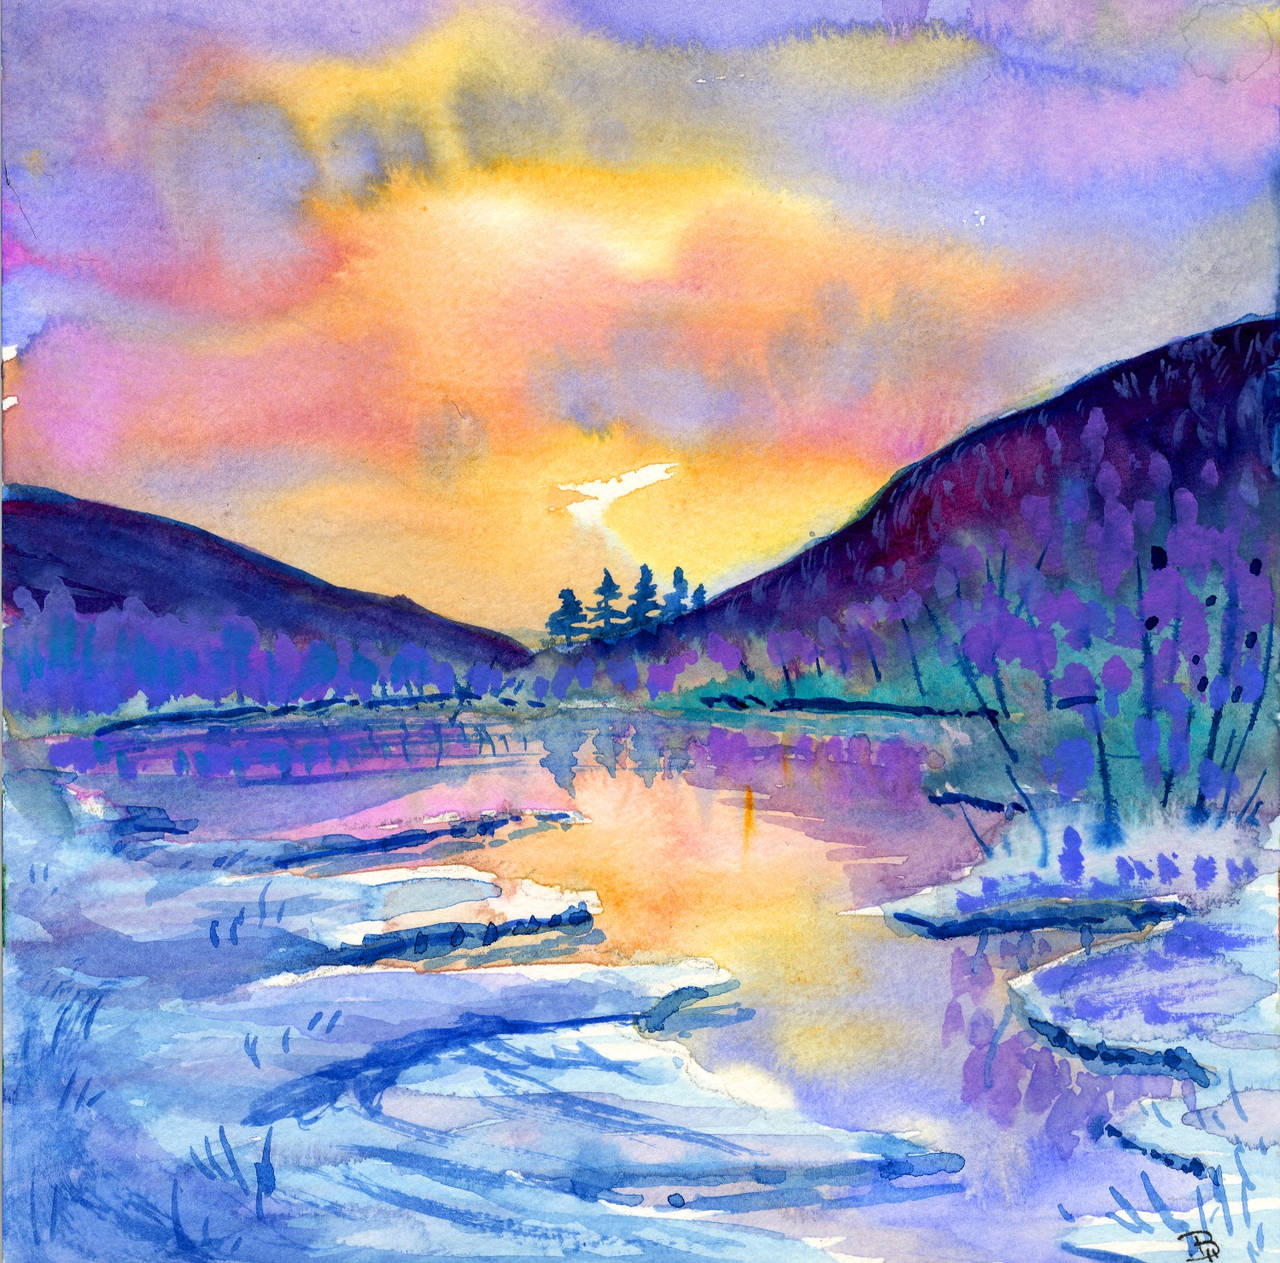 frozen dawn by beckhanson